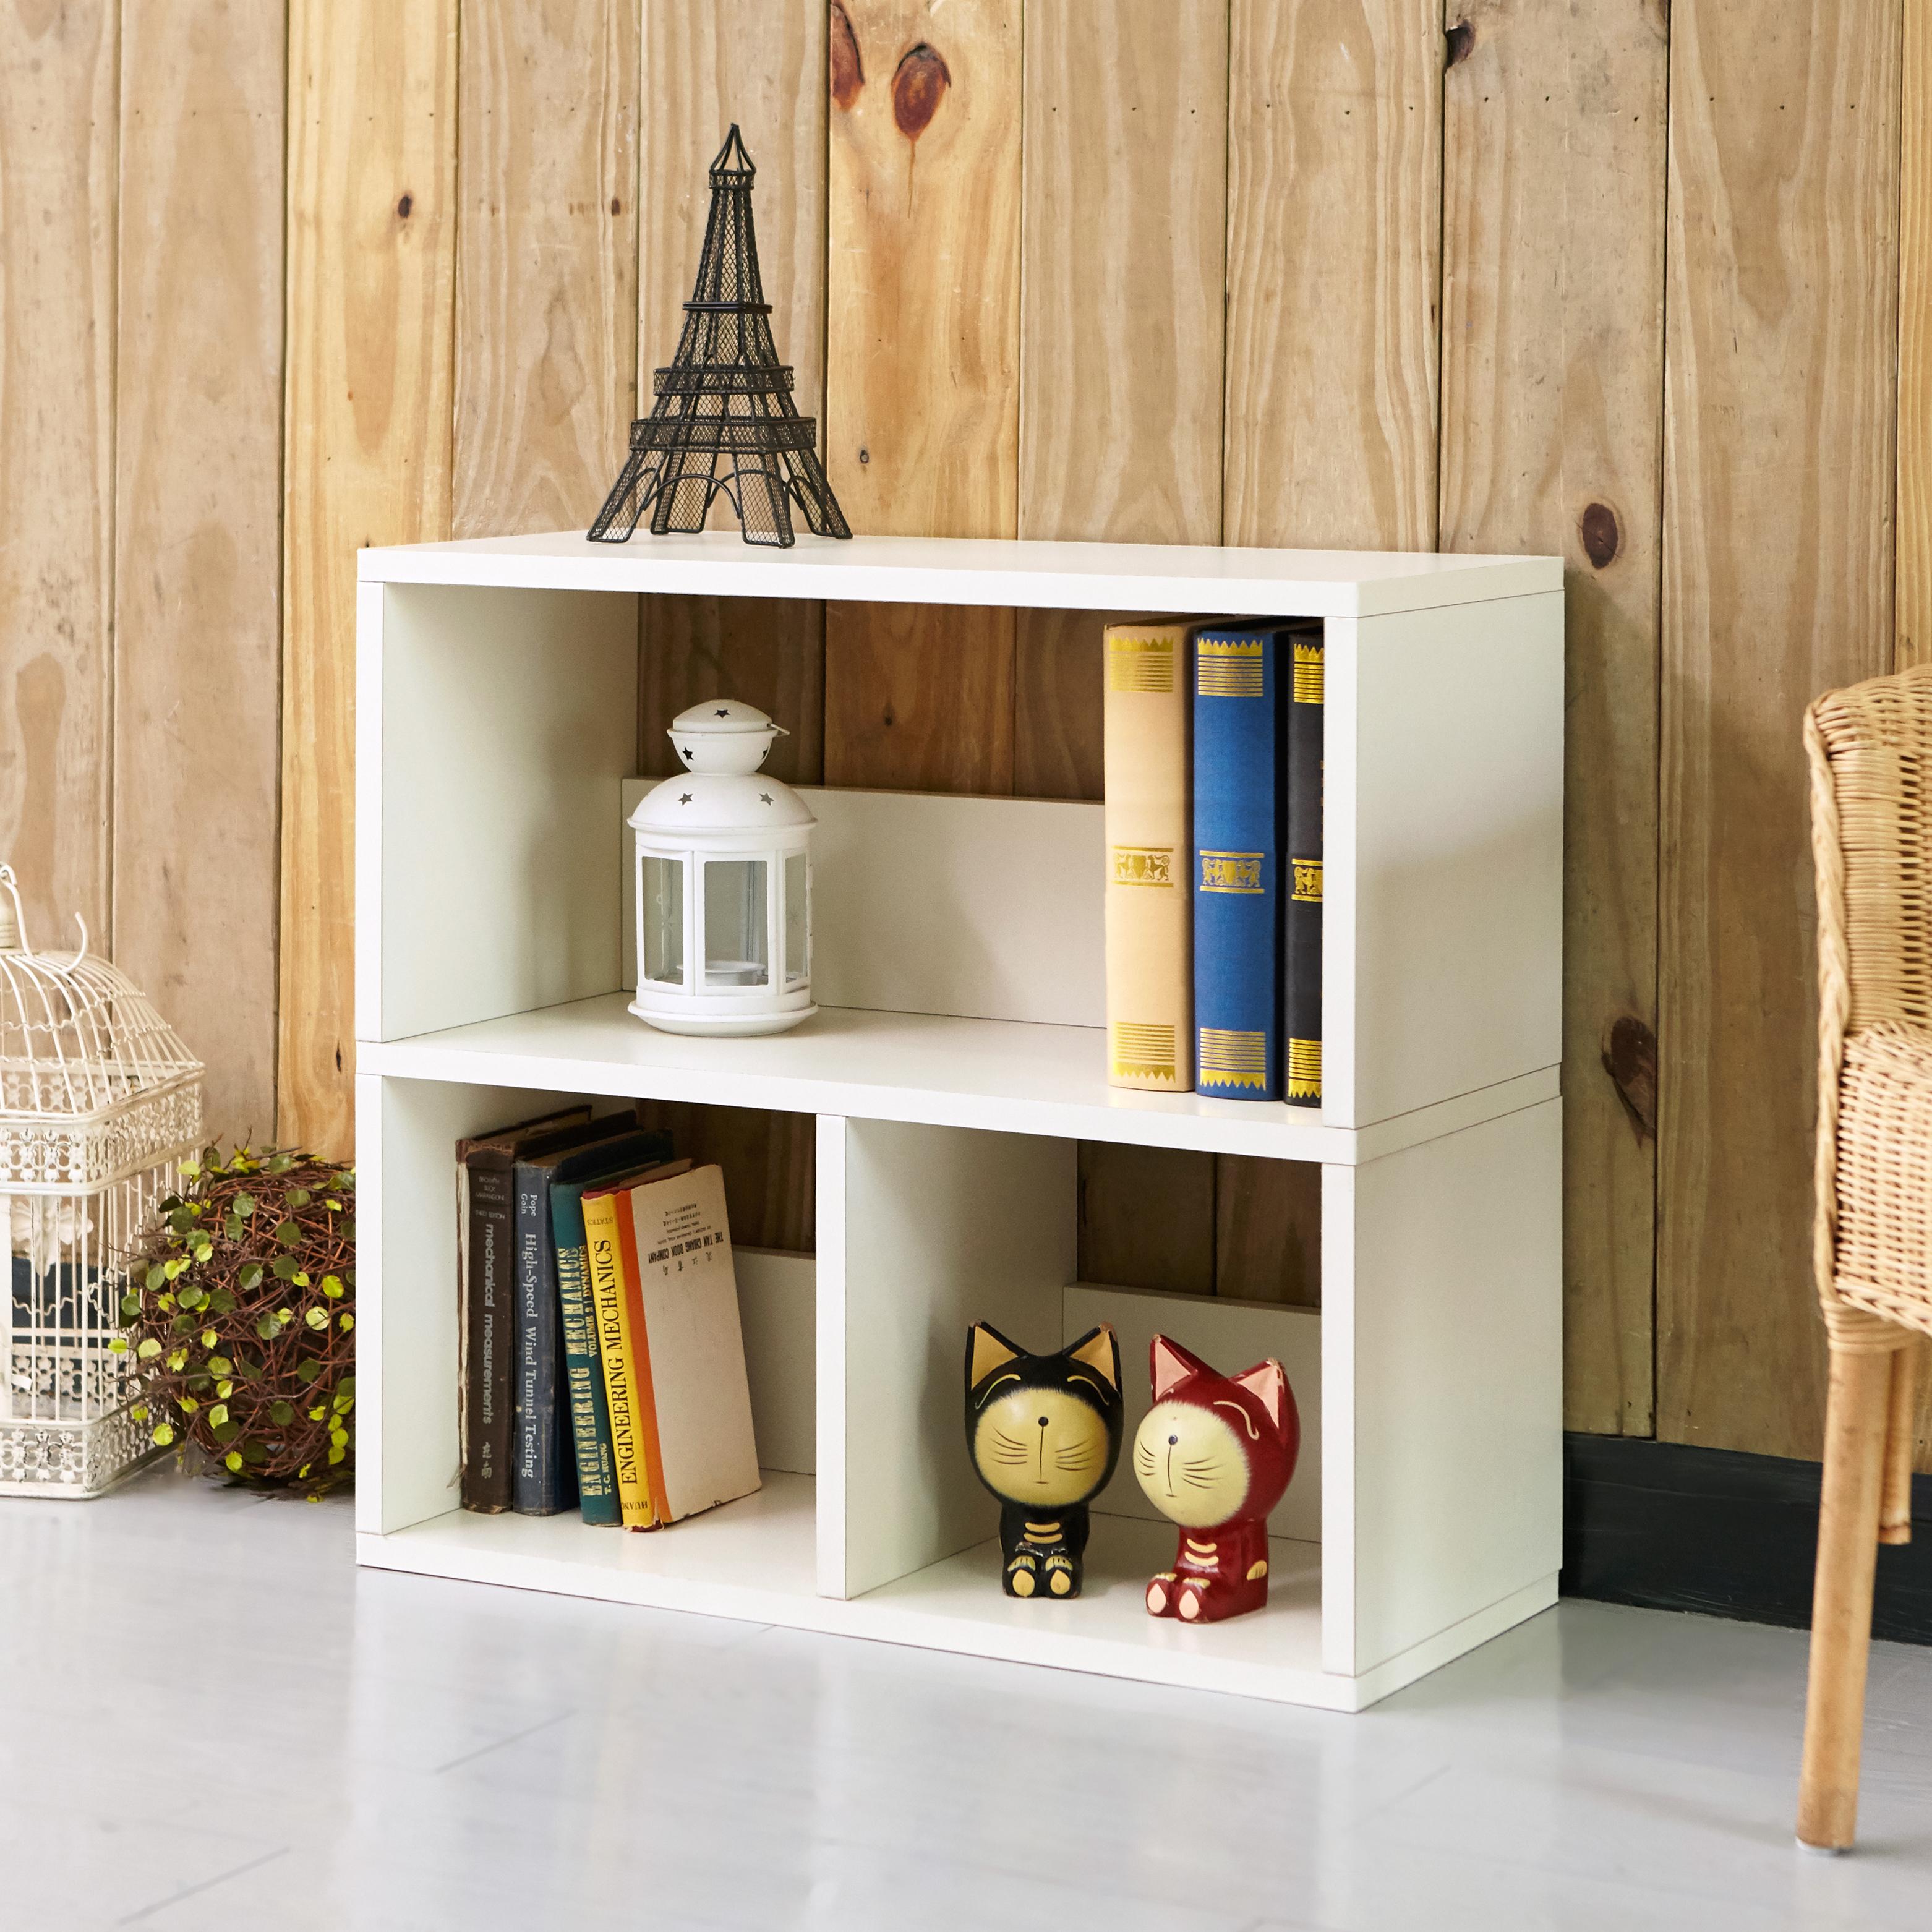 Way Basics Eco Friendly Collins Cubby Bookshelf and Organizer, White (Lifetime Warranty)